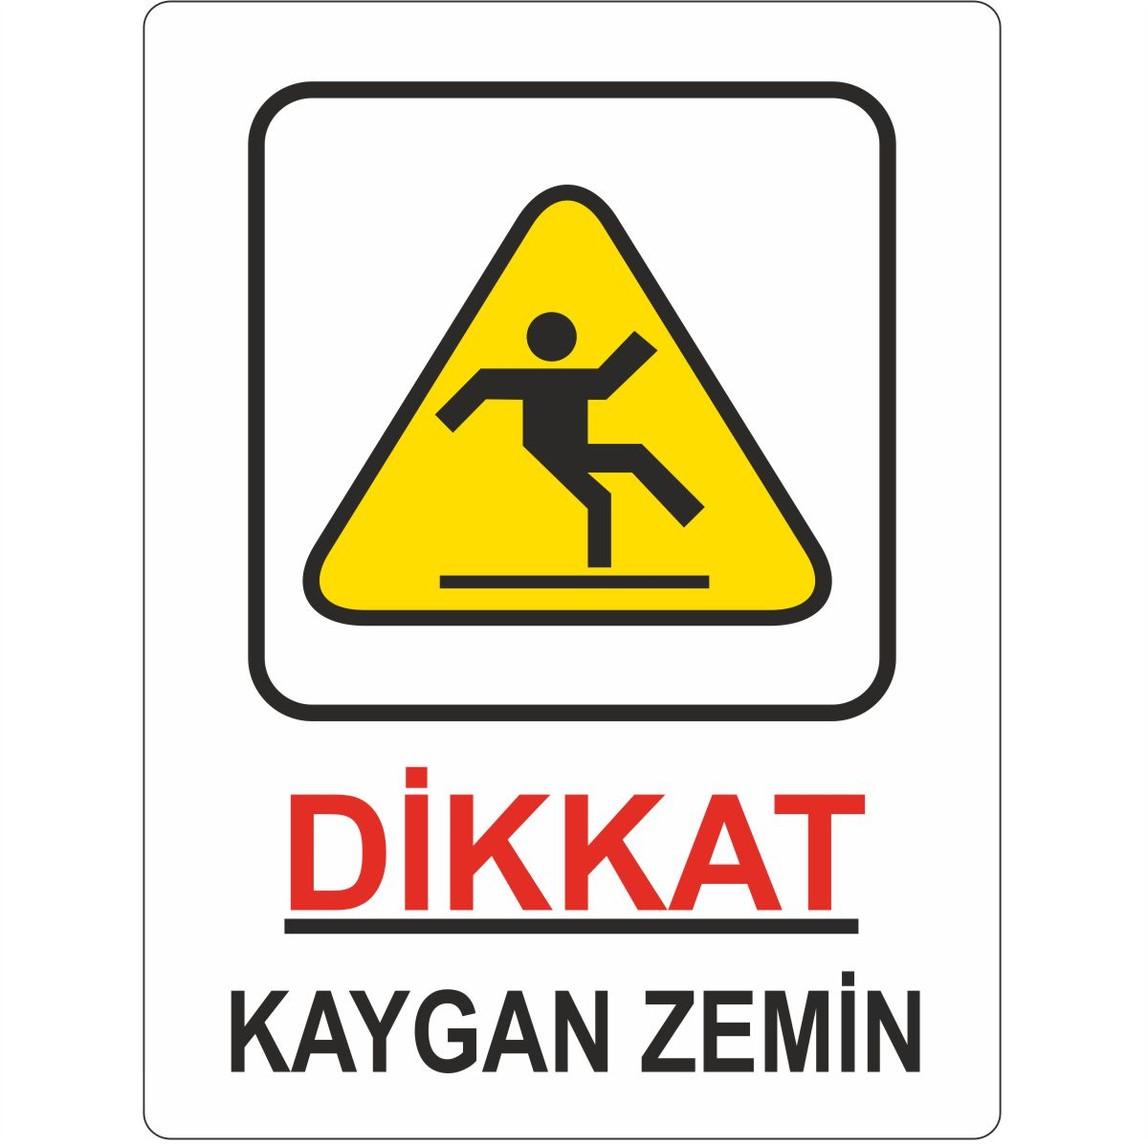 25x35 cm Pvc Dikkat Kaygan Zemin